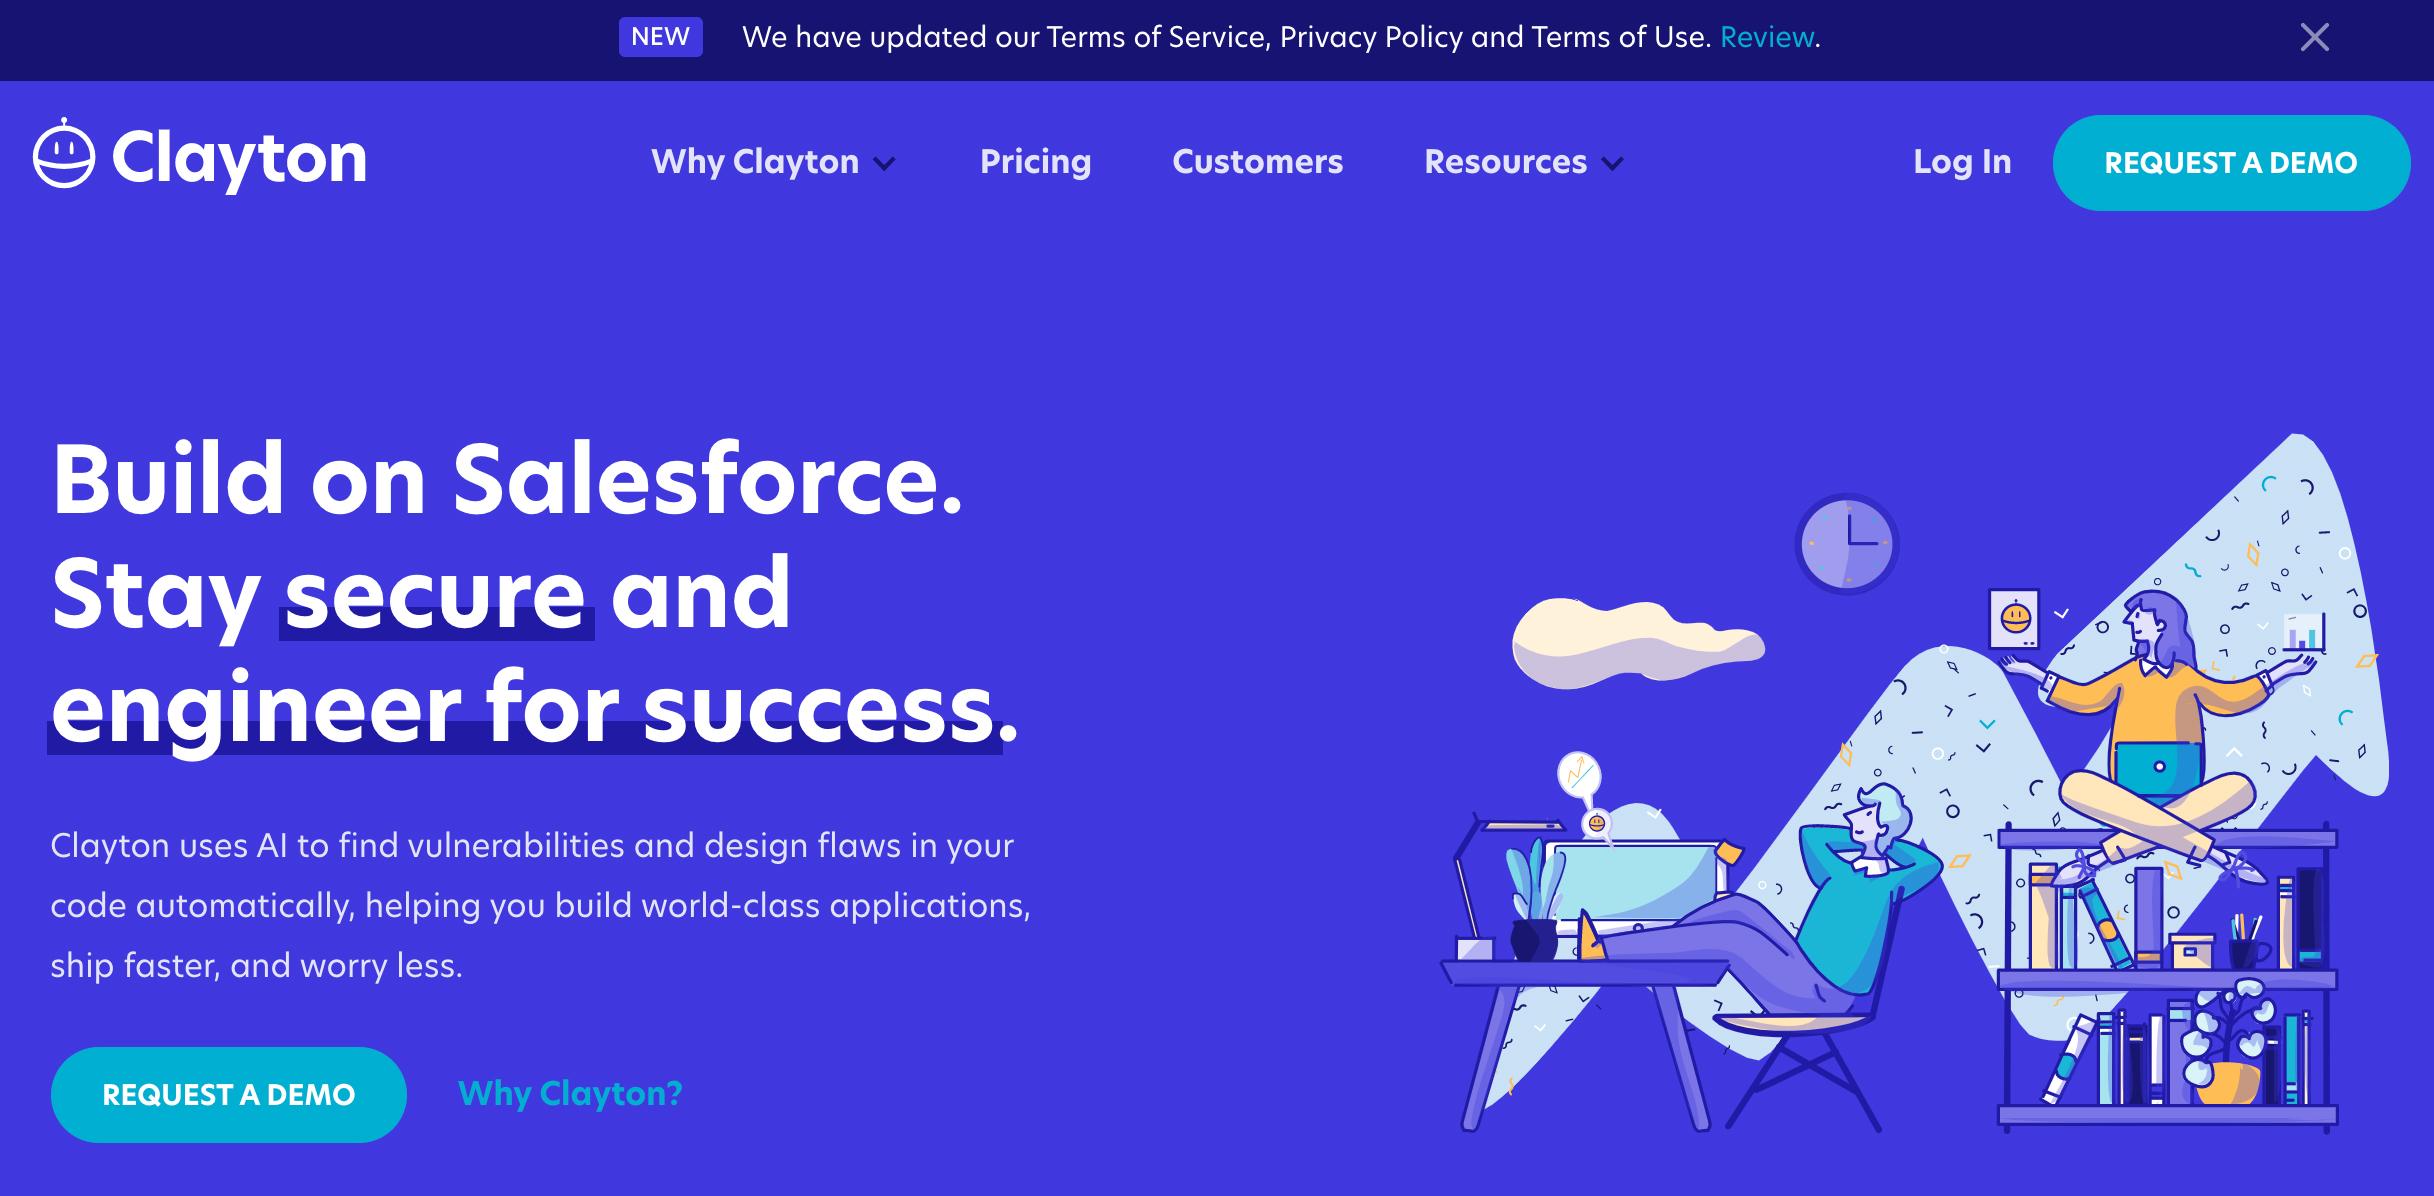 clayton-homepage-illustration-tostoini